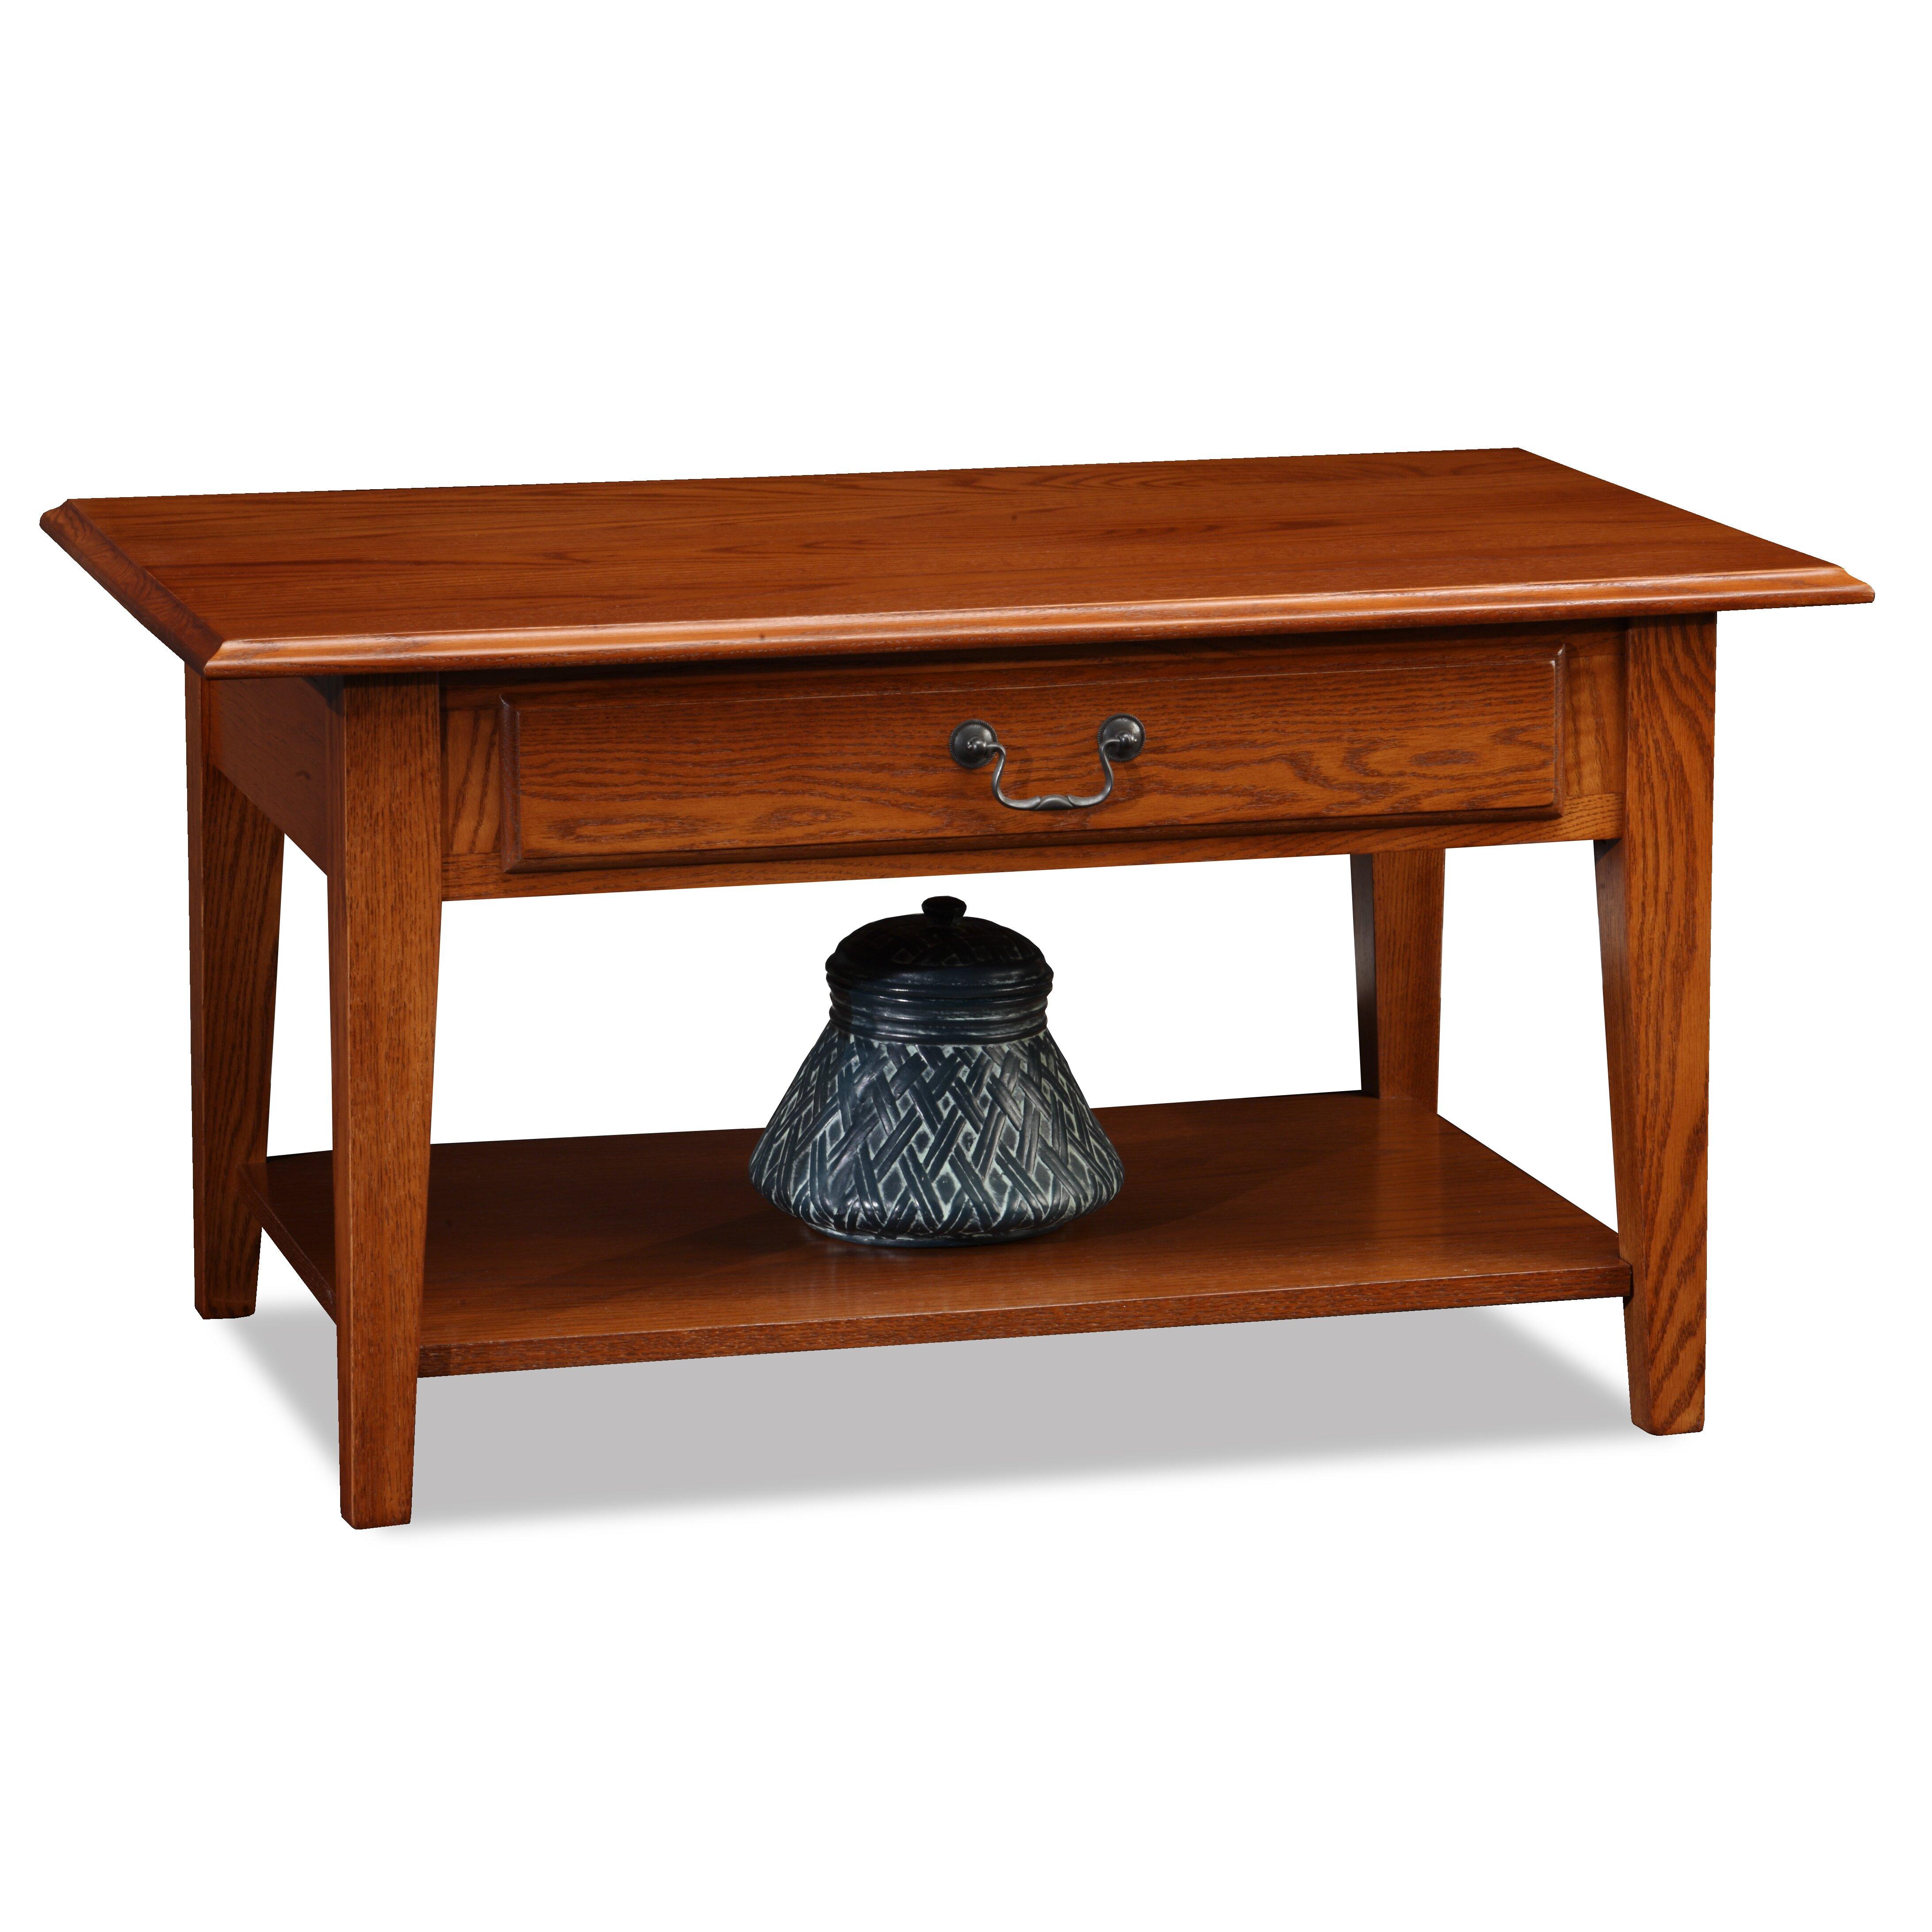 Leick shaker coffee table reviews wayfair for Wayfair shop furniture